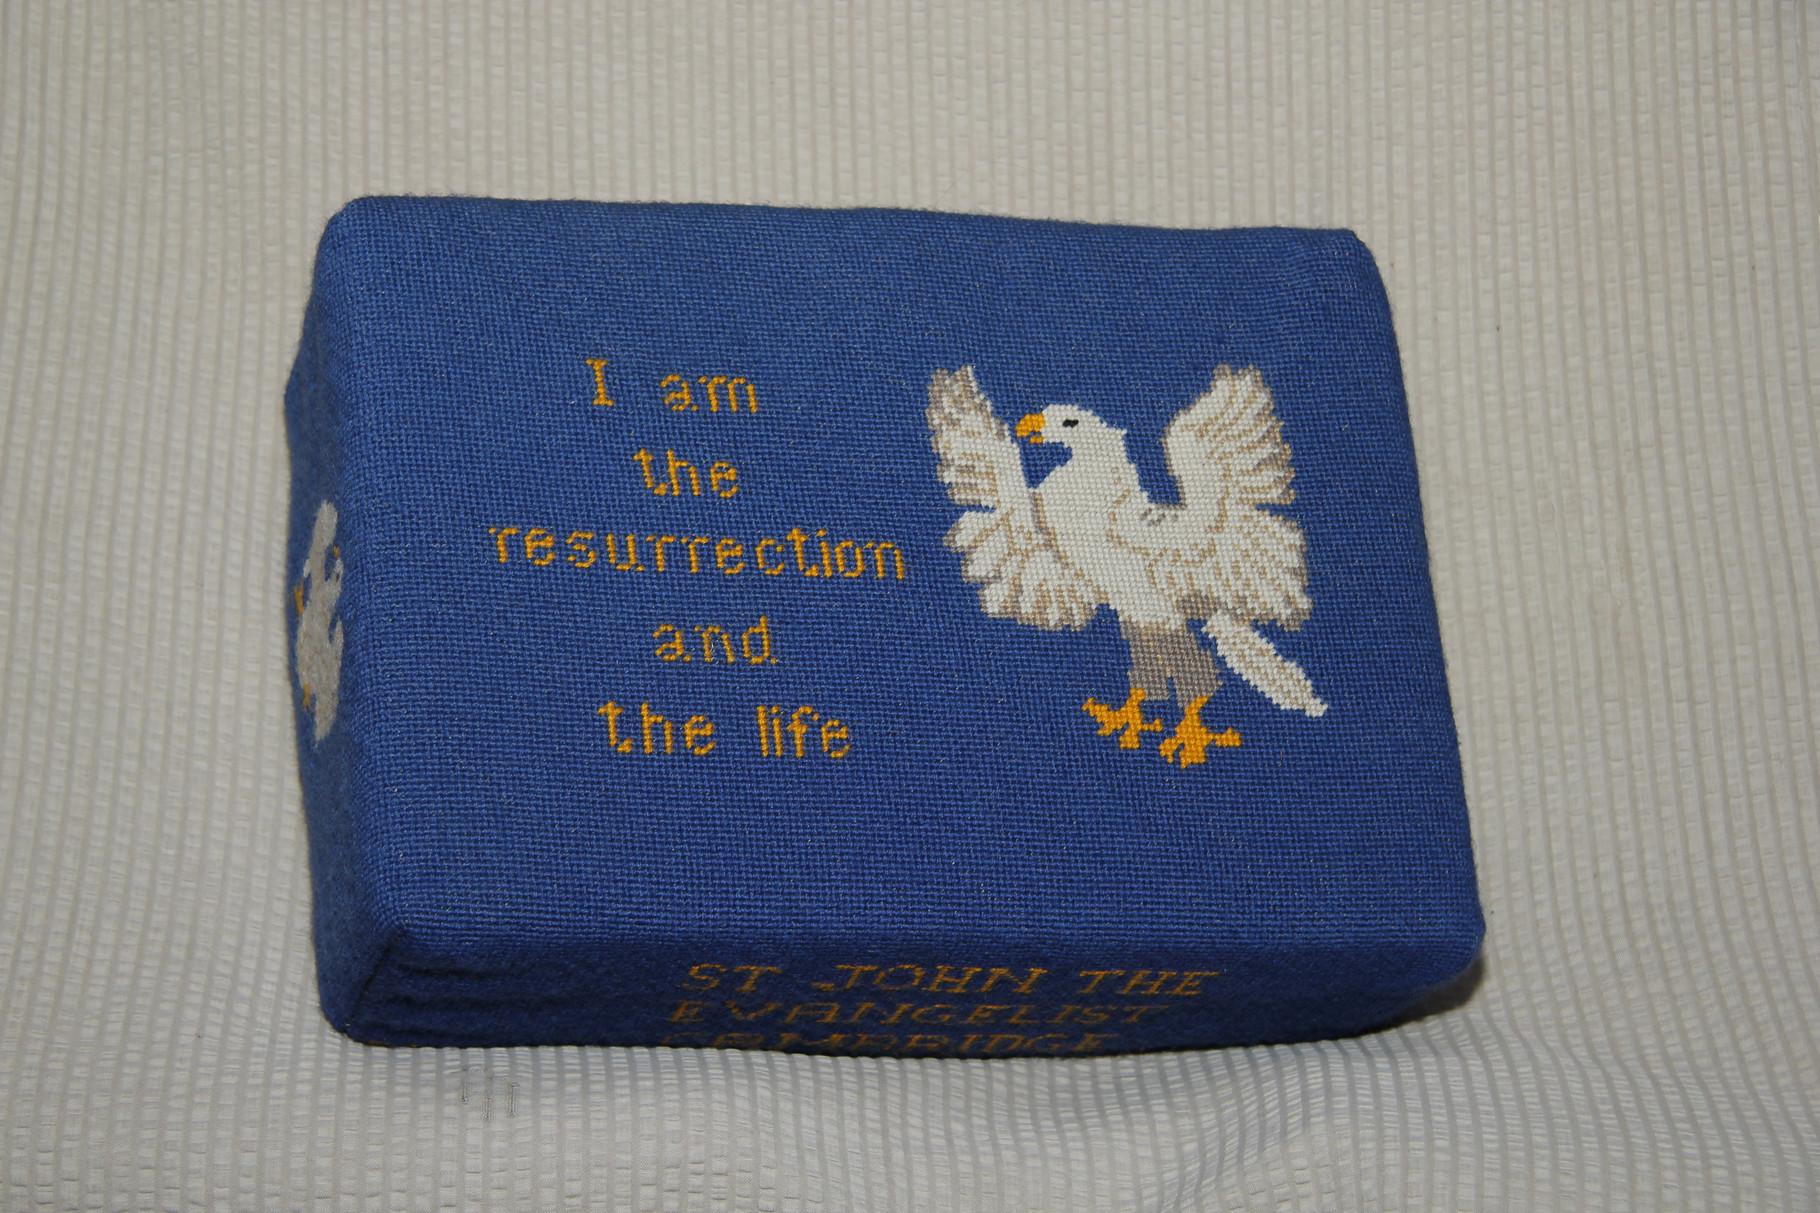 6. Eagle (St John) in memory of Rev. Joseph N. Sanders  (1913-1961) donated and worked by Dorothy Sanders